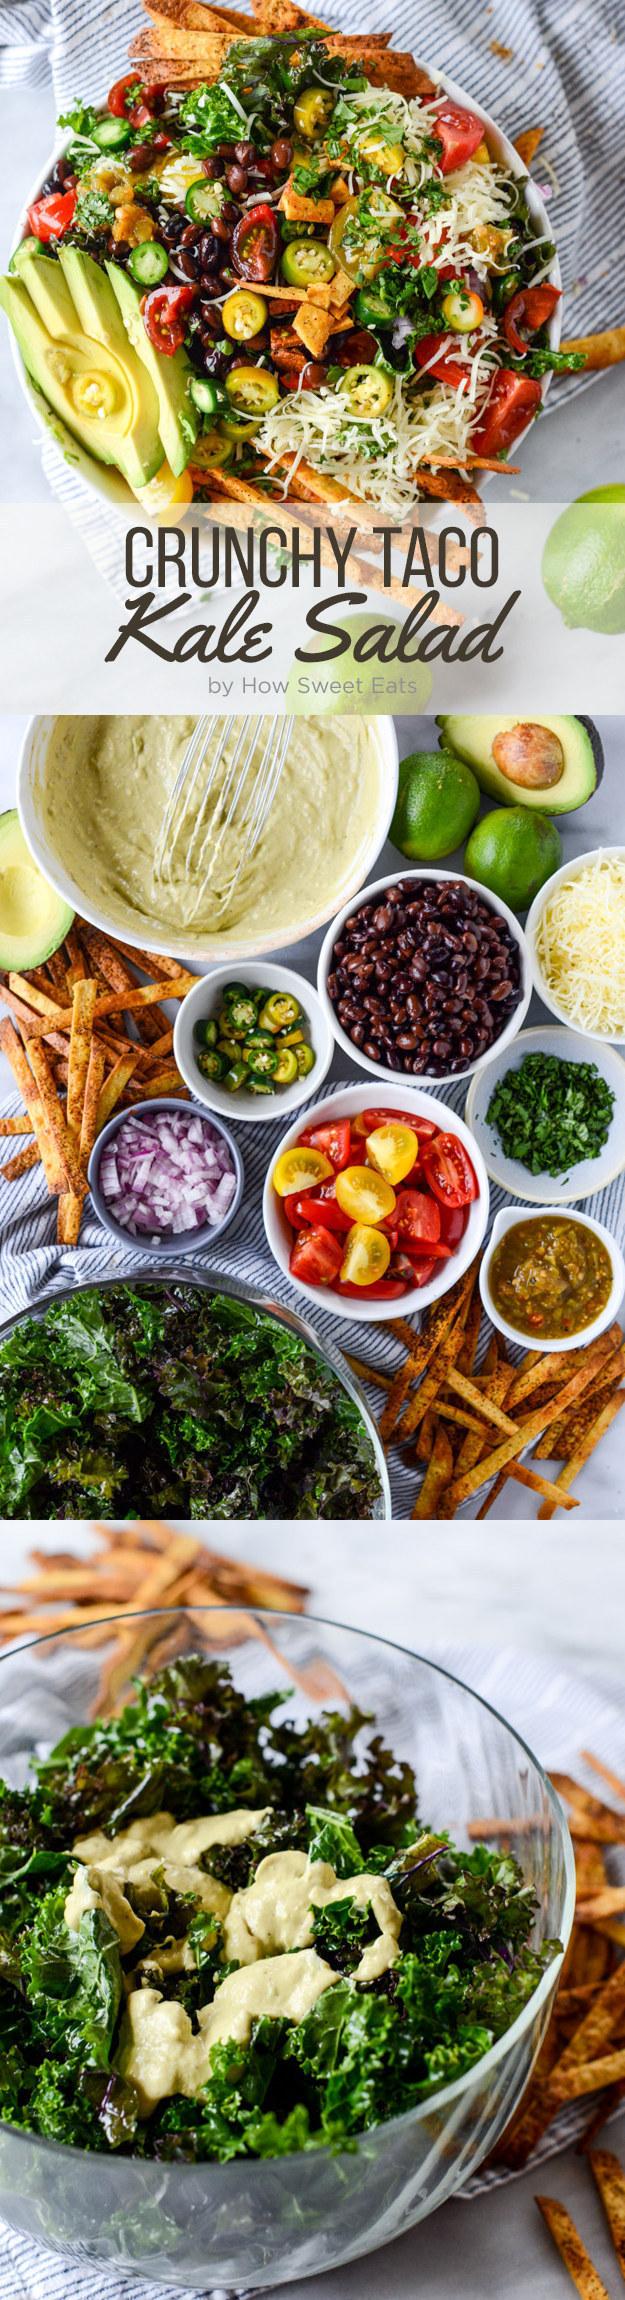 Crunchy Taco Kale Salad